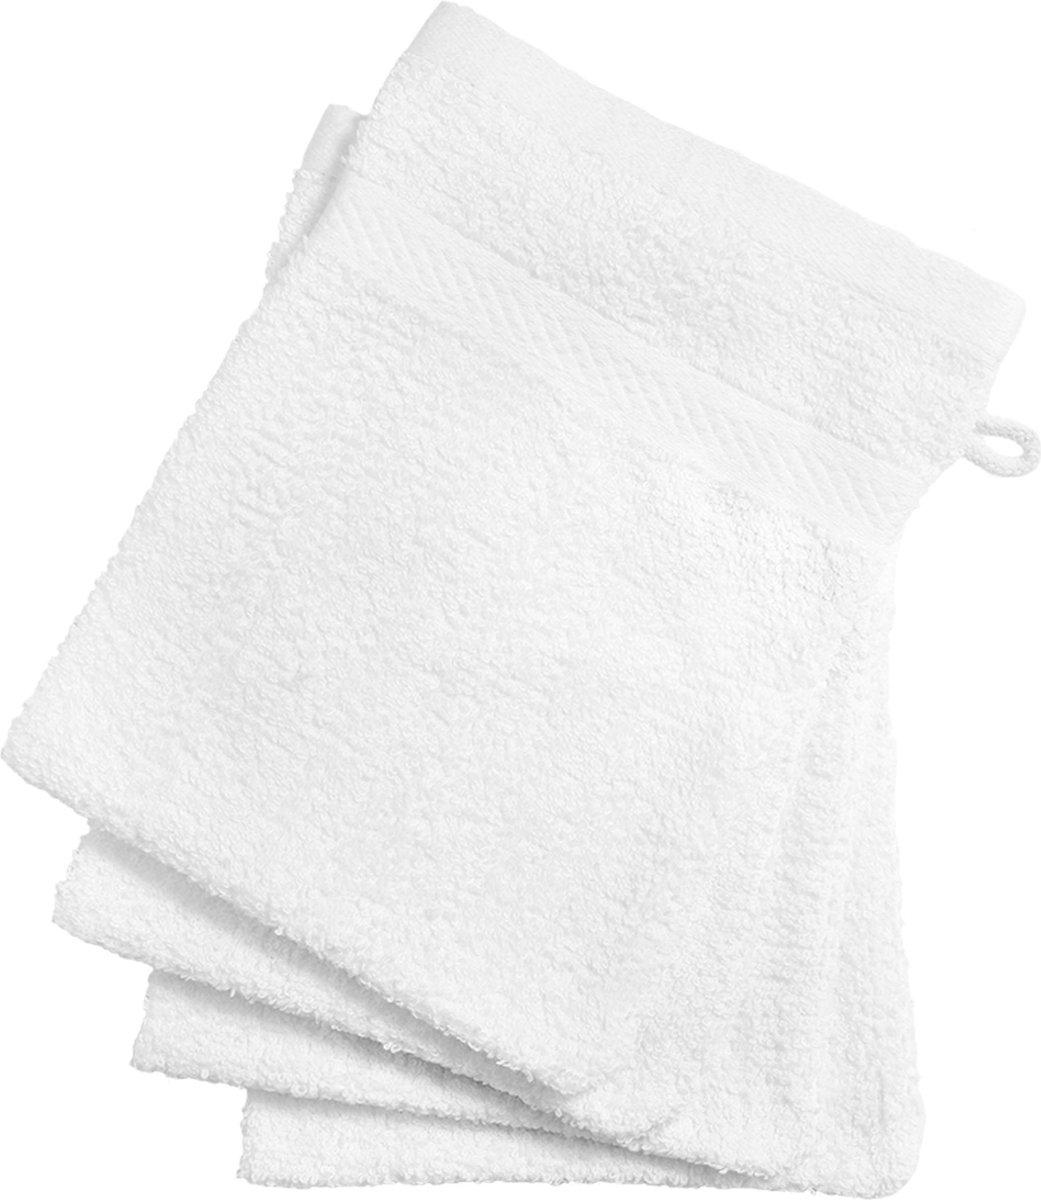 Washandjes - 12 stuks - Wit